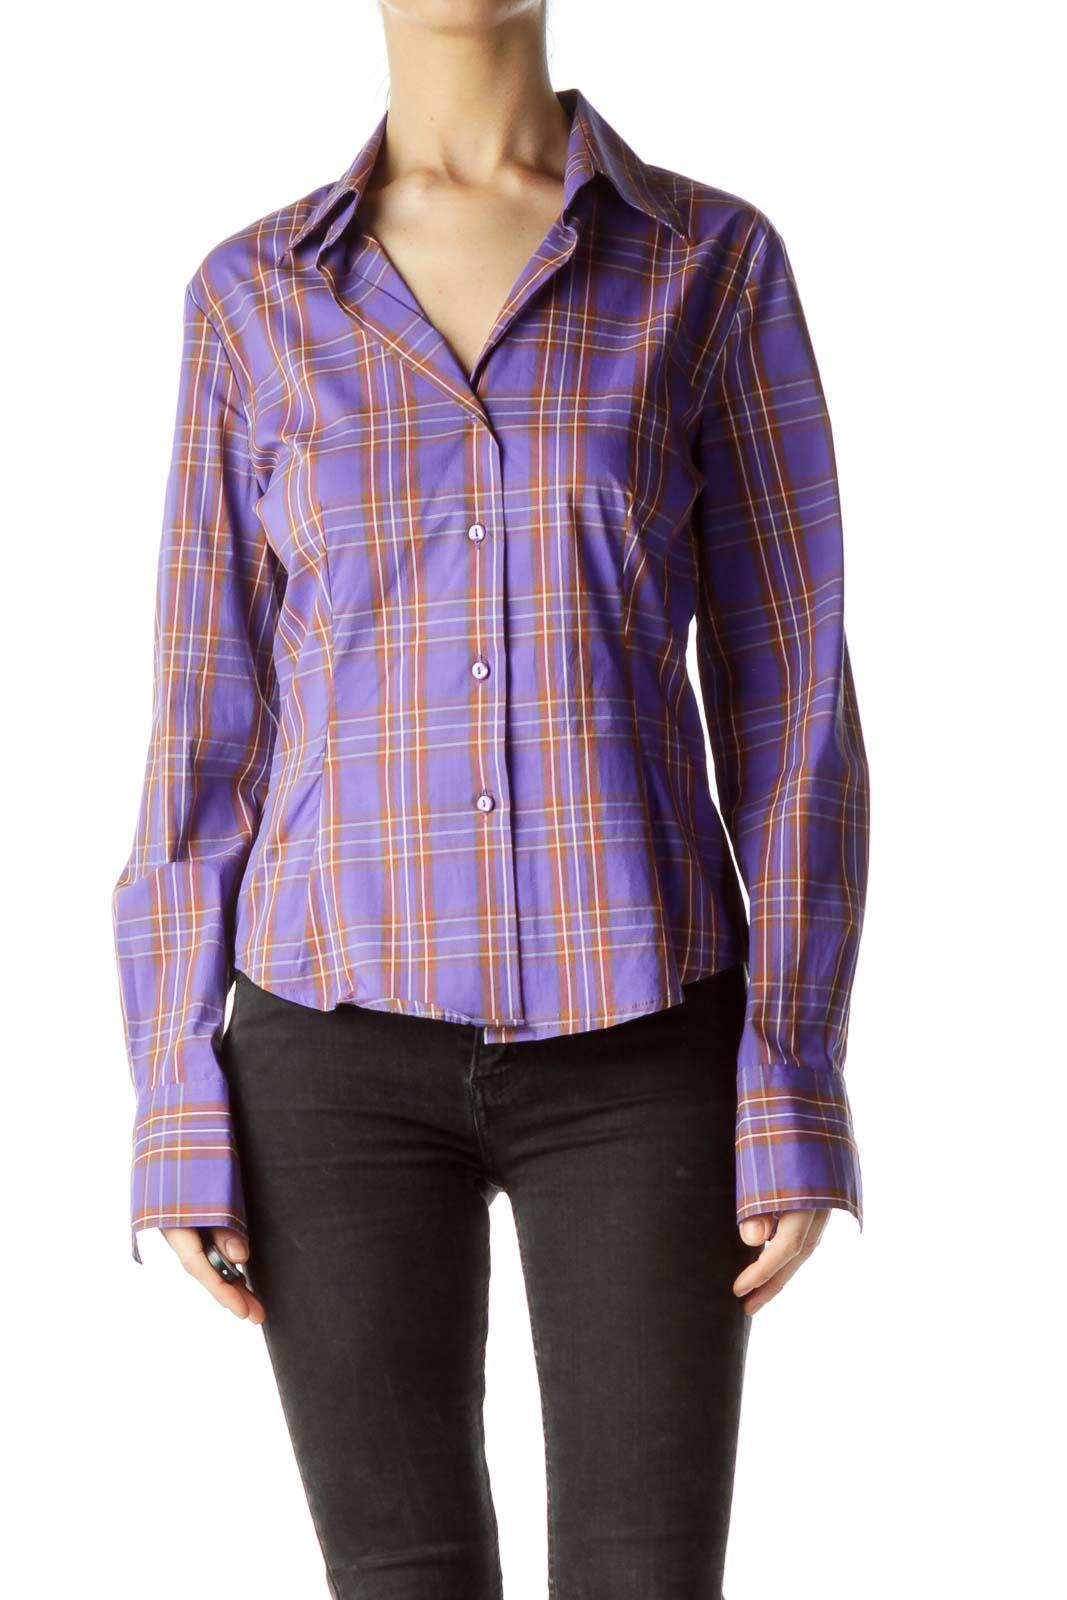 Purple Multicolored Plaid Shirt Front